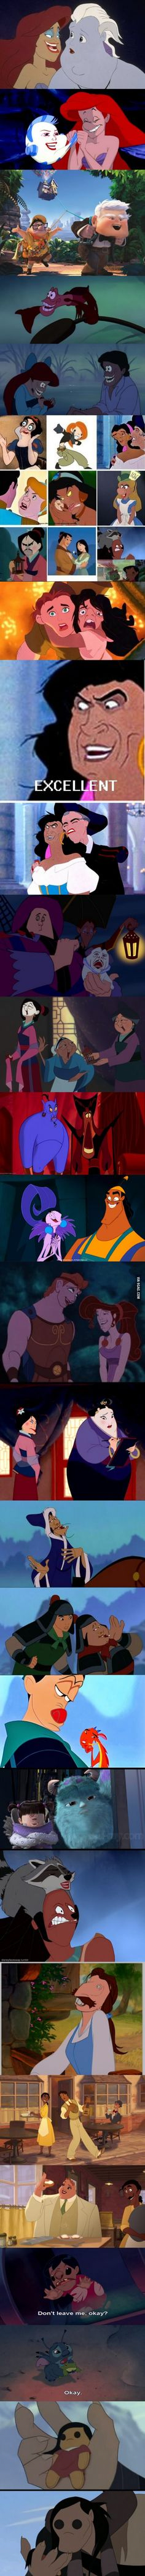 Disney Face Swap